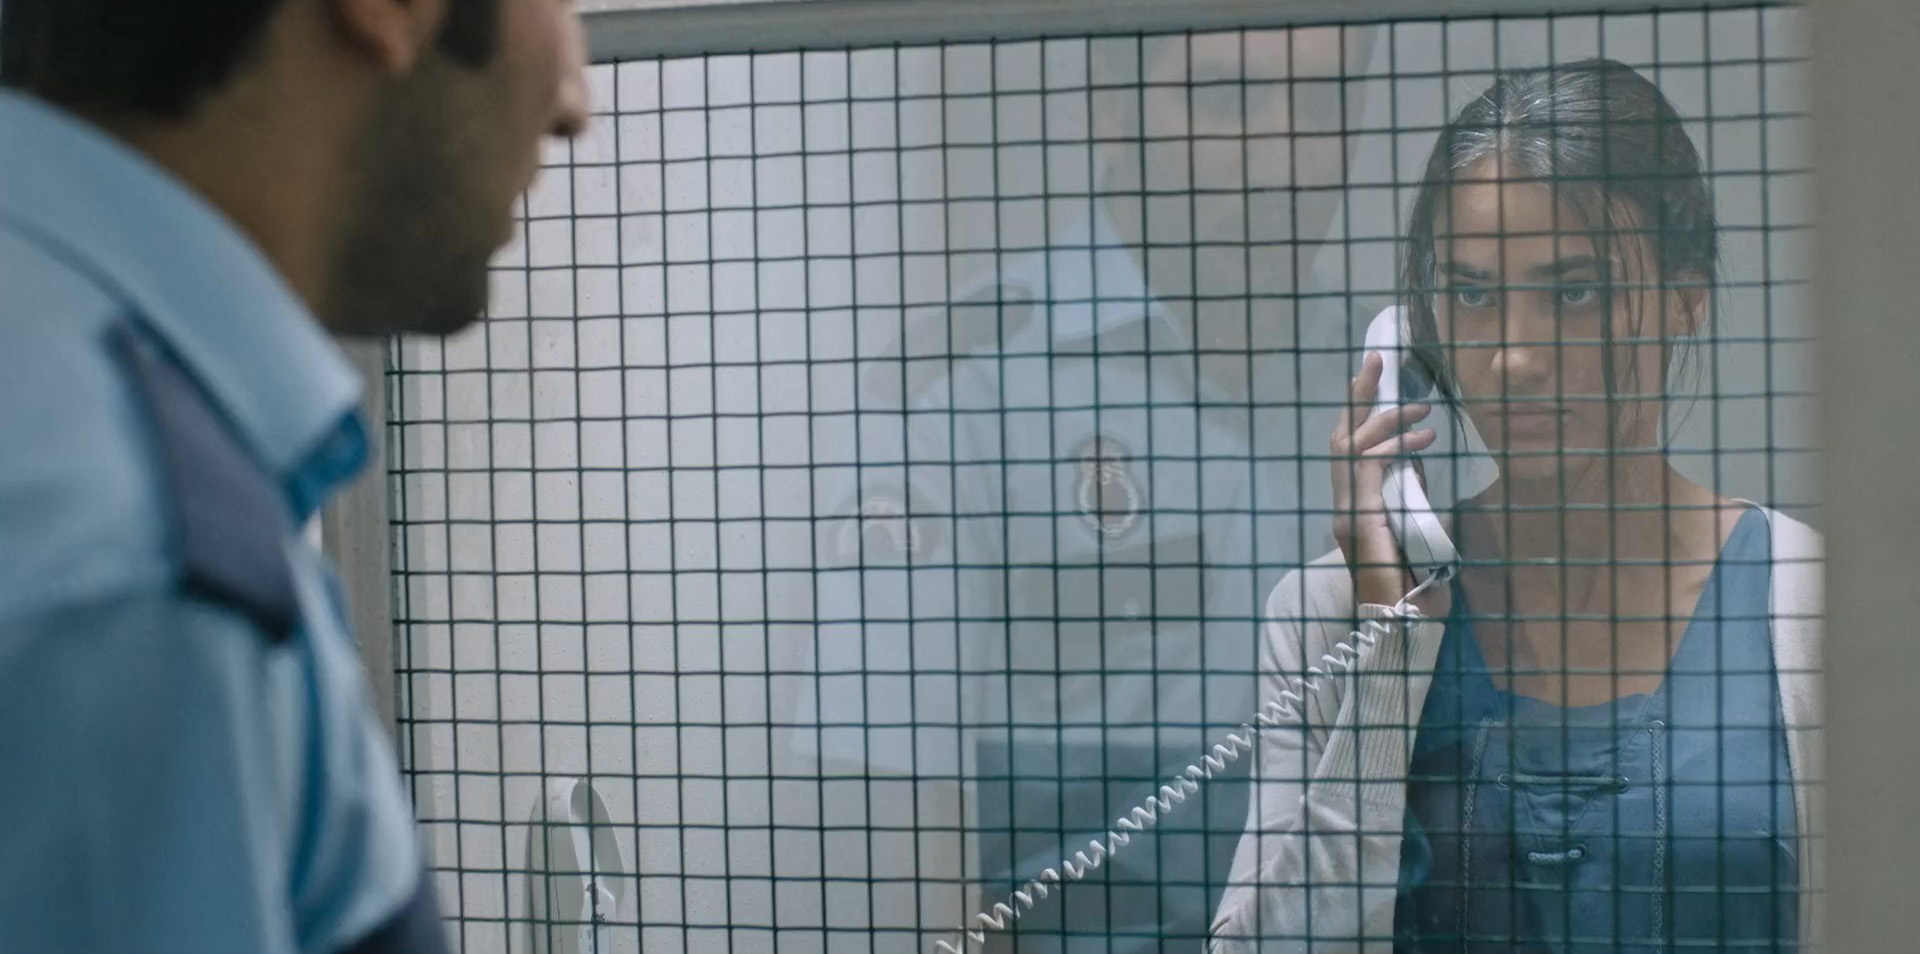 Görülmüştür   2020   Yerli Film   NF   WEB-DL   XviD   Sansürsüz   720p - 1080p - m720p - m1080p   WEB-DL   Tek Link